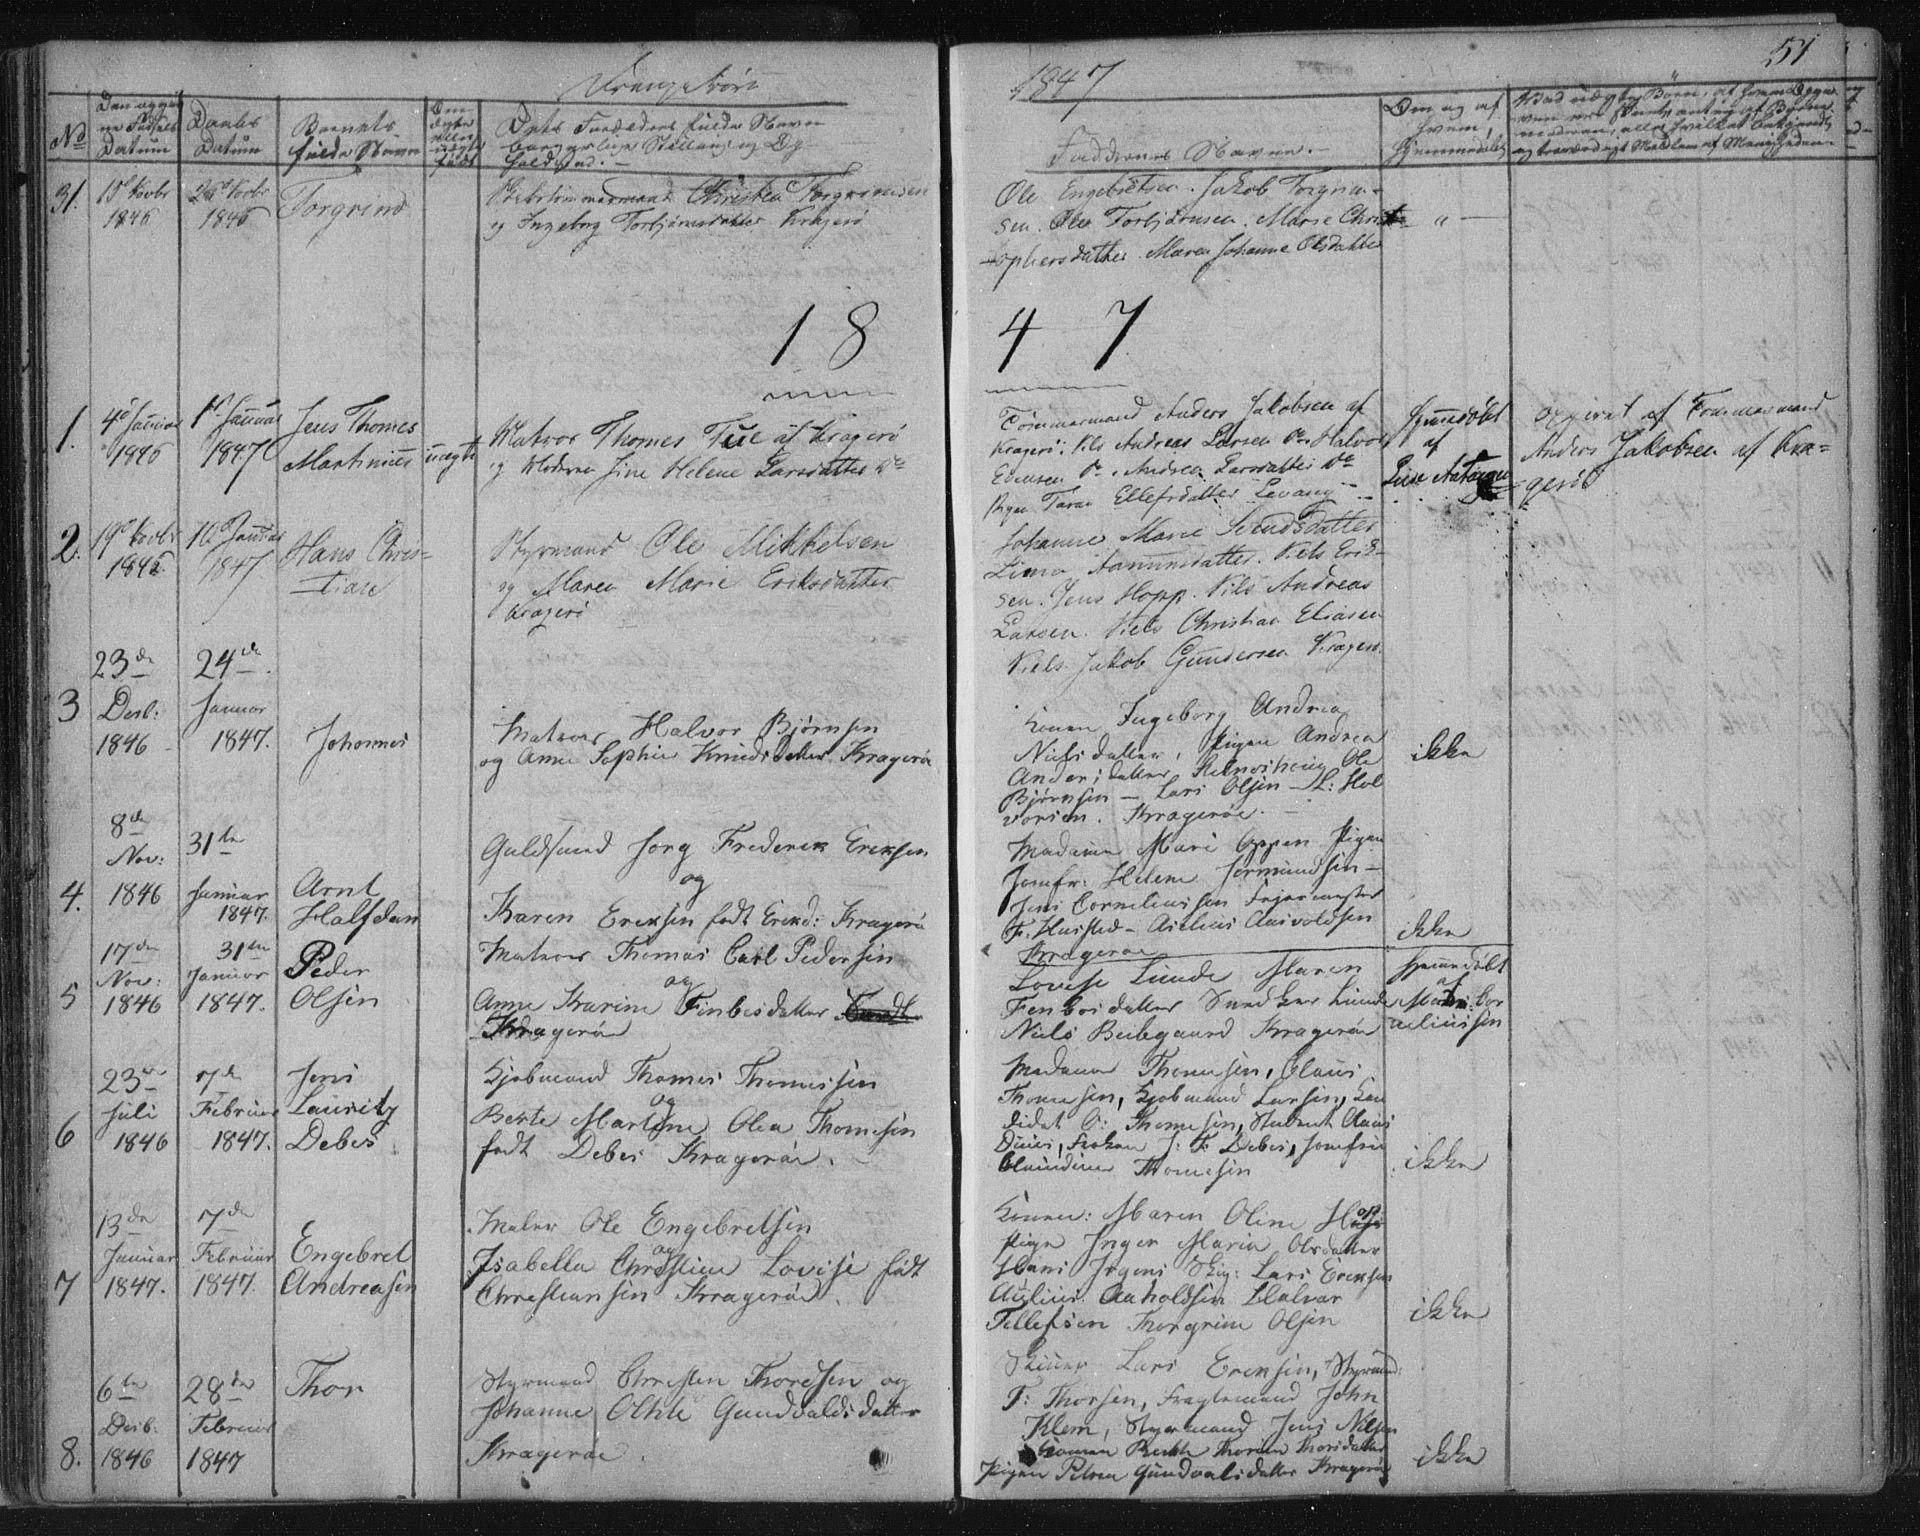 SAKO, Kragerø kirkebøker, F/Fa/L0005: Ministerialbok nr. 5, 1832-1847, s. 51